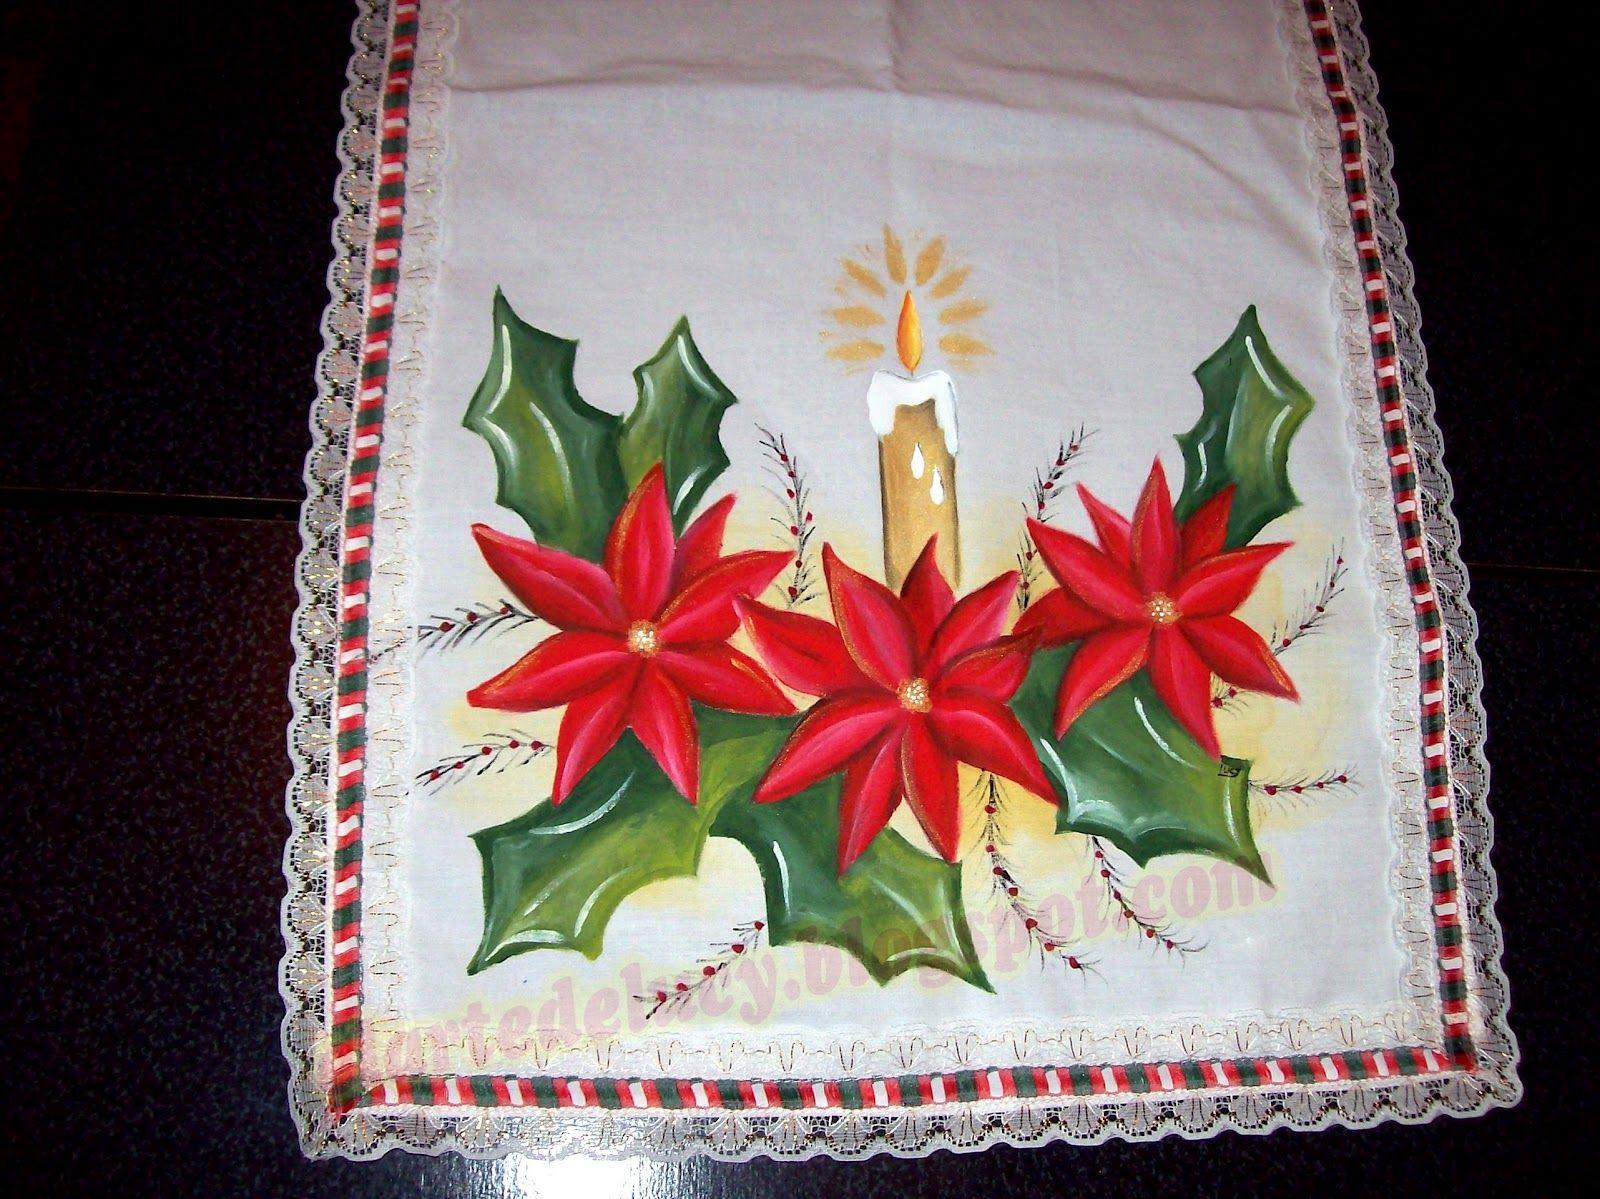 Dibujos navideos para pintar en tela interesting pintar - Motivos navidenos para pintar en tela ...